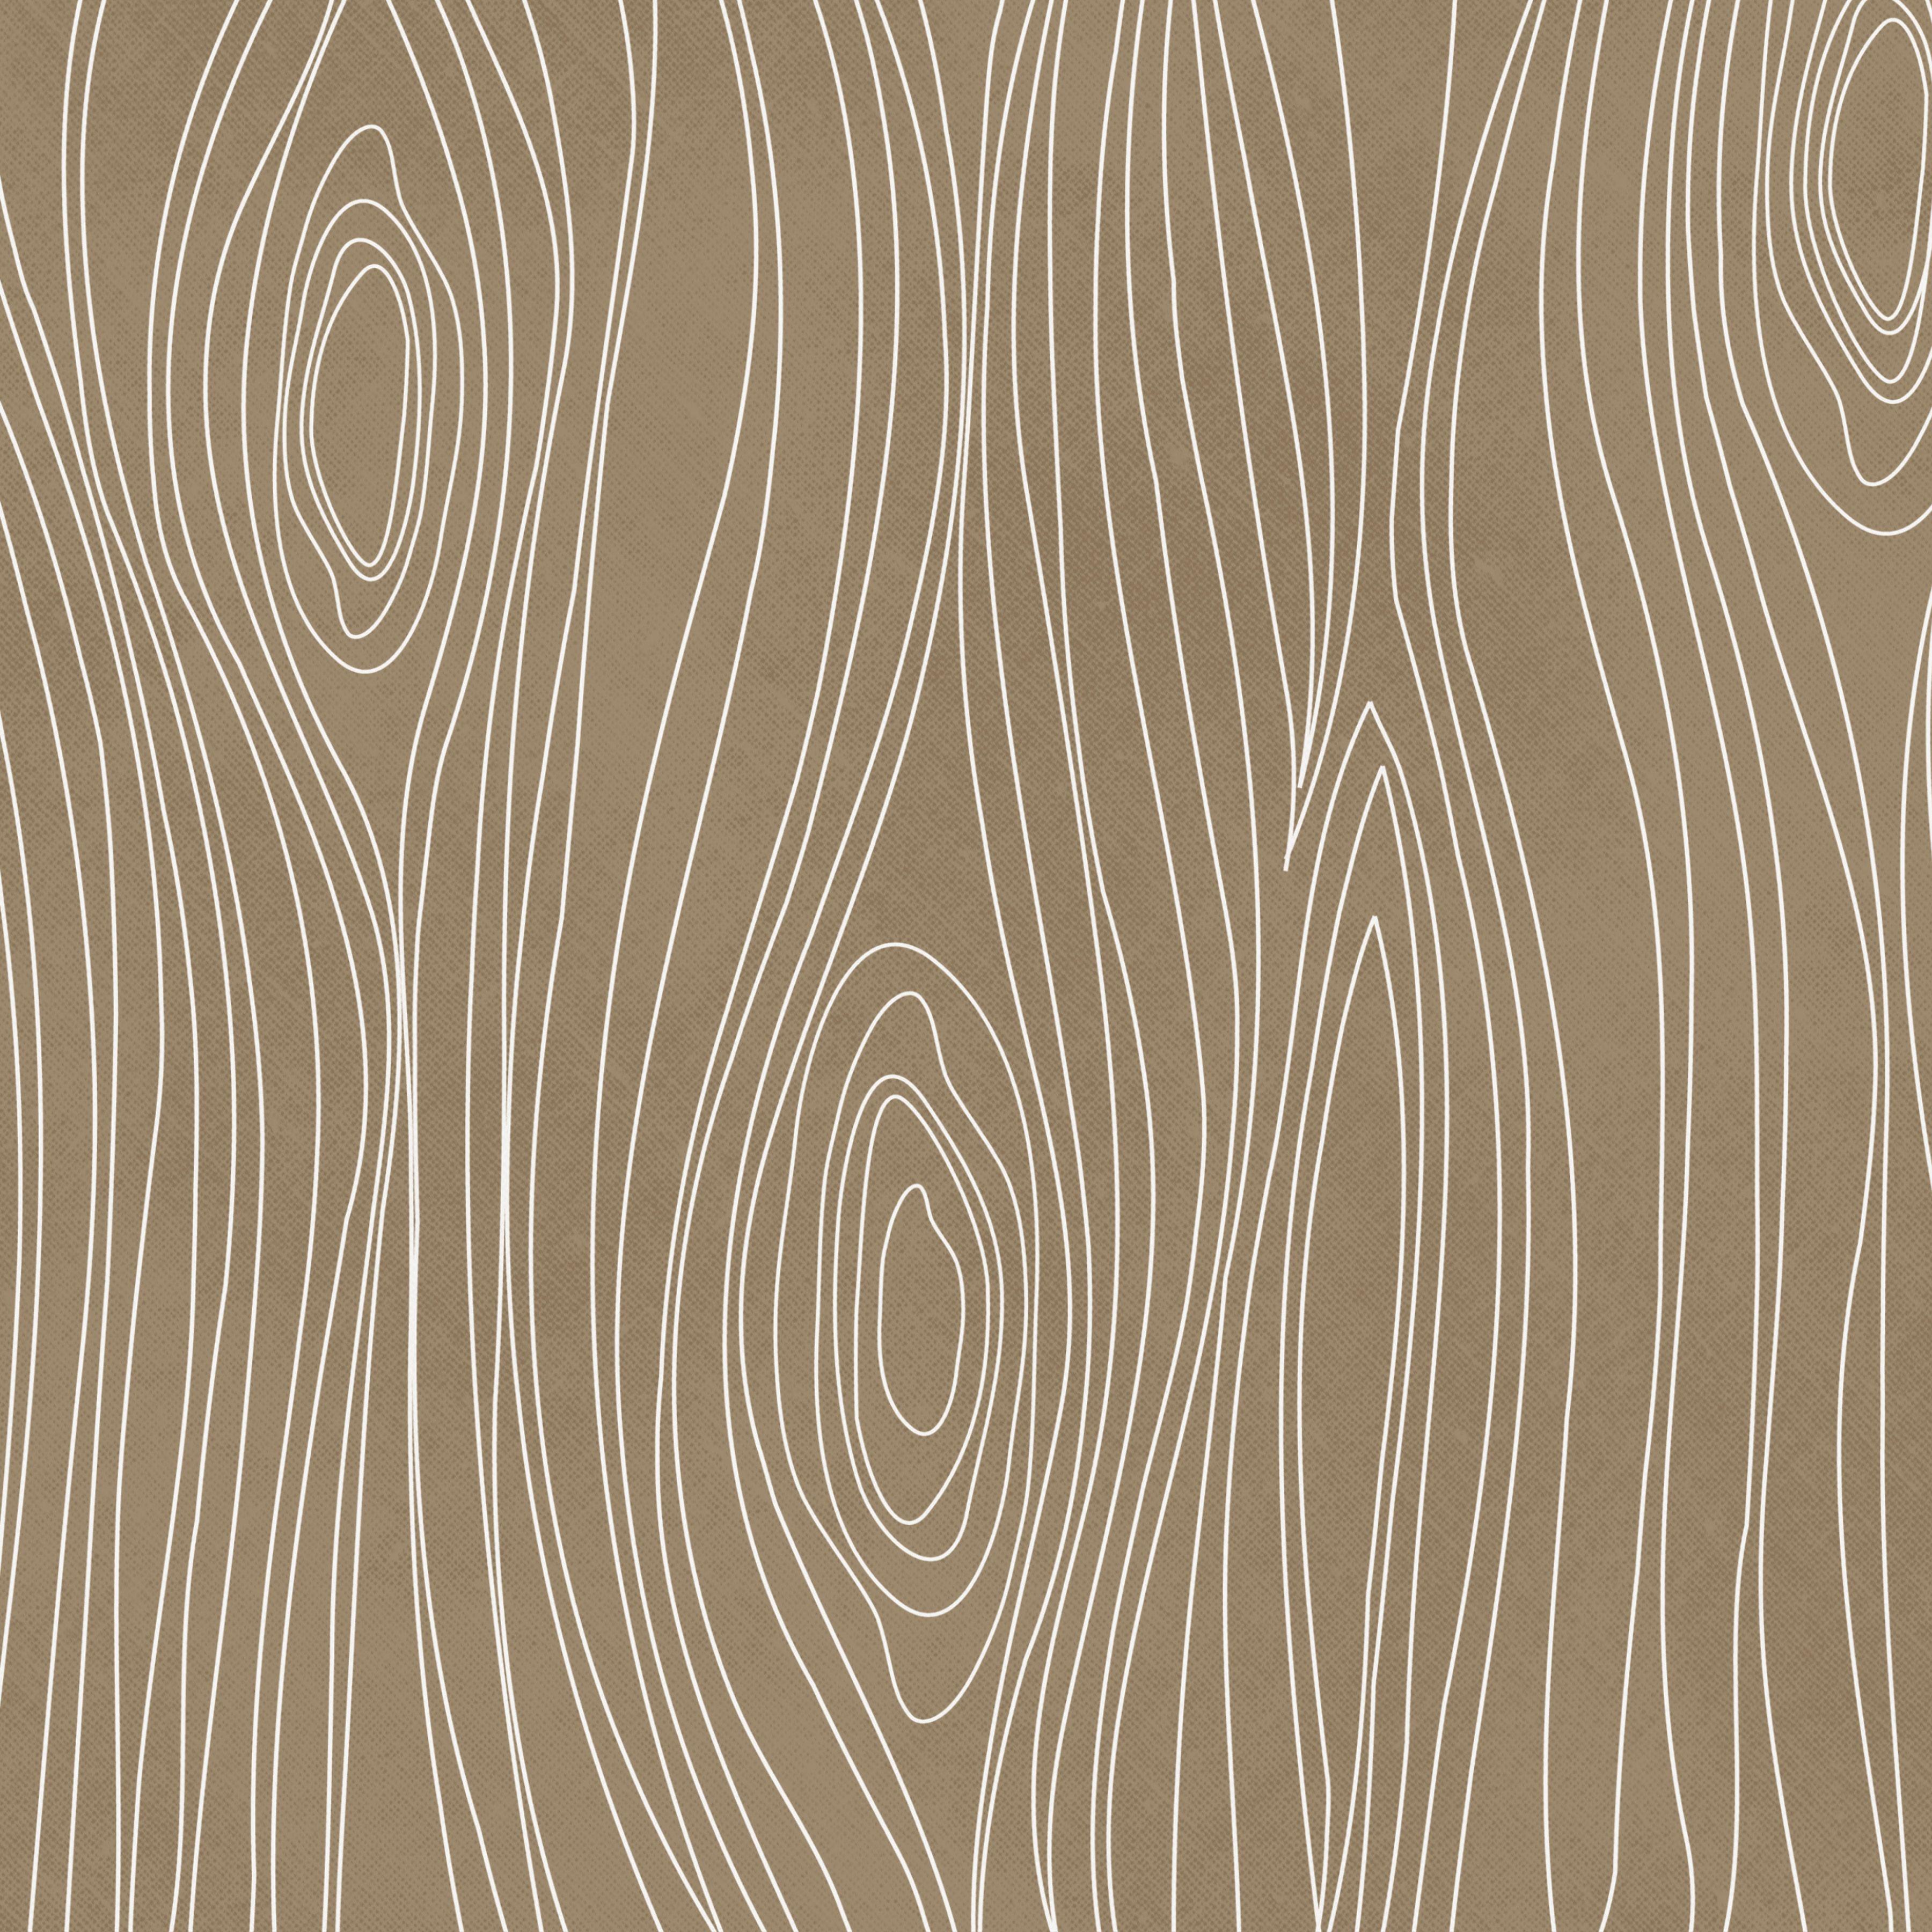 Faux Bois Wallpaper pinmolly o'connell on faux bois | pinterest | google images